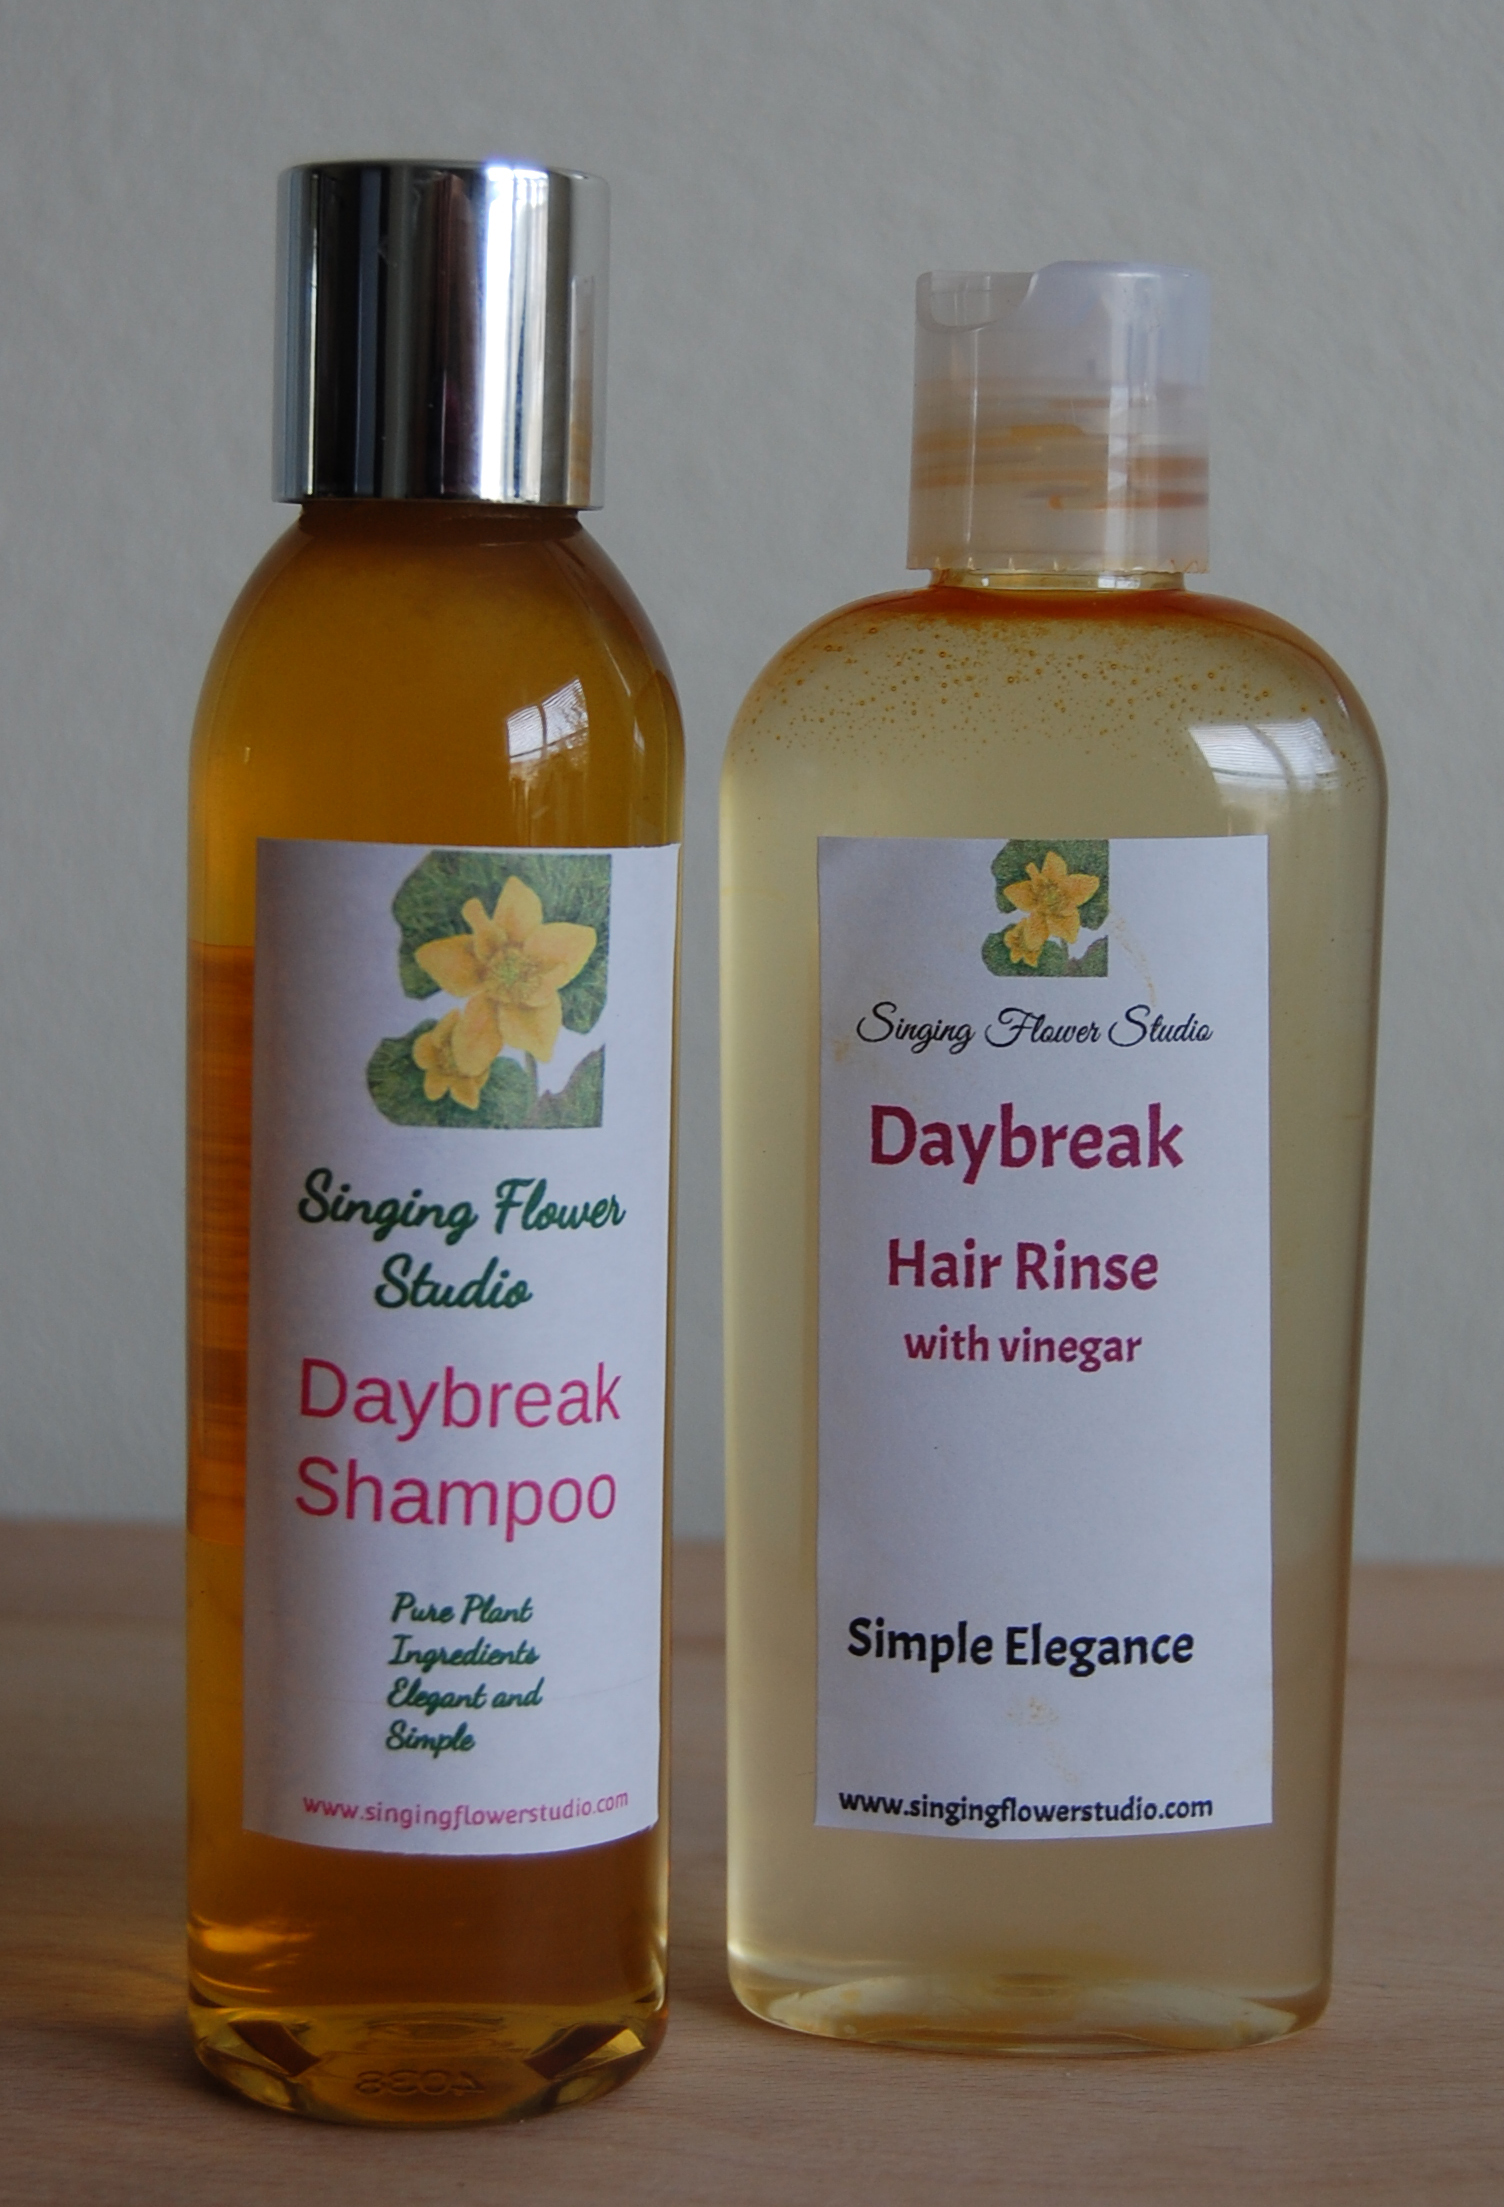 Daybreak Shampoo and Rinse with Vinegar